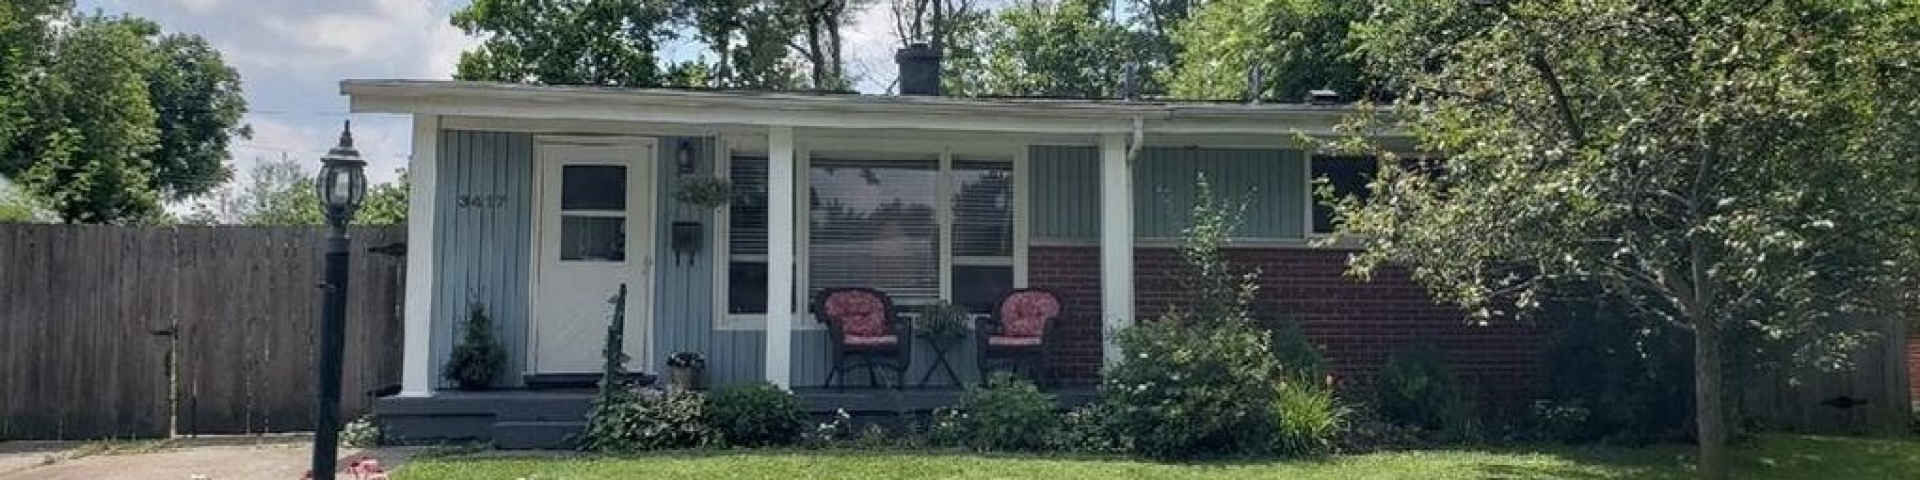 3417 Pobst,Kettering,Ohio 45420,2 Bedrooms Bedrooms,7 Rooms Rooms,2 BathroomsBathrooms,House,Pobst,756796